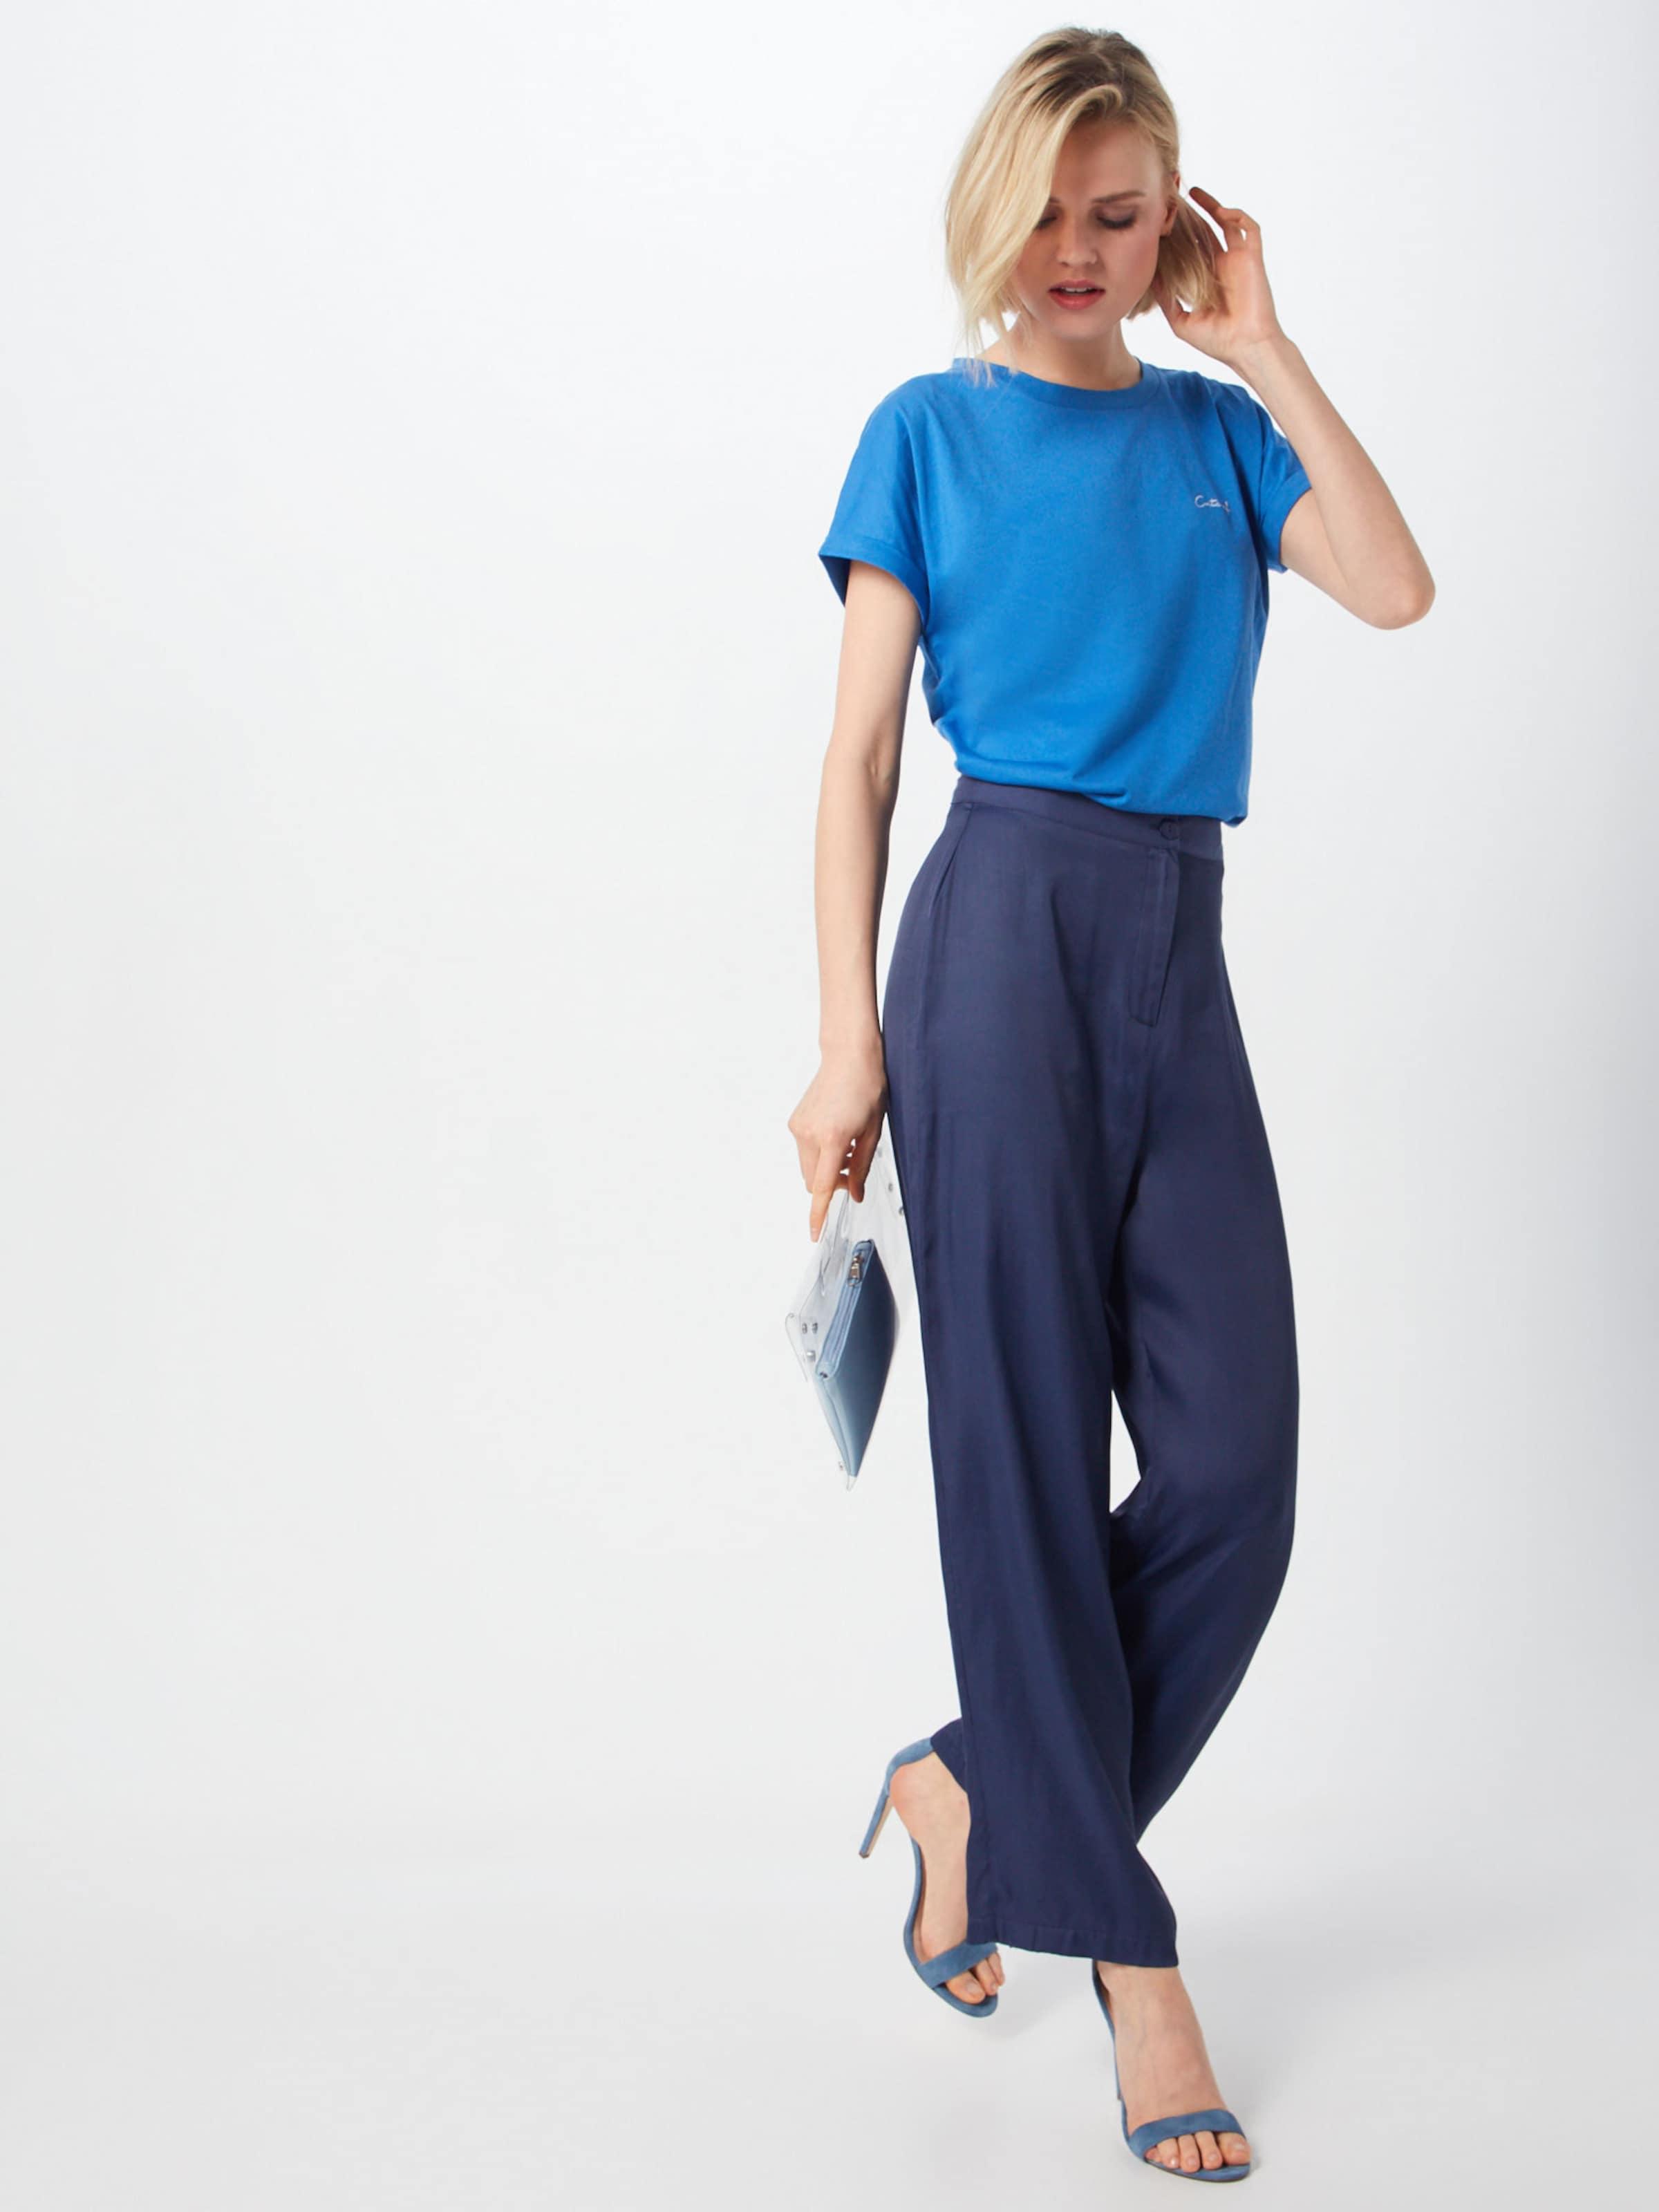 Lena Gercke By Foncé En Leger Pantalon Bleu 'ina' sdtQrCh